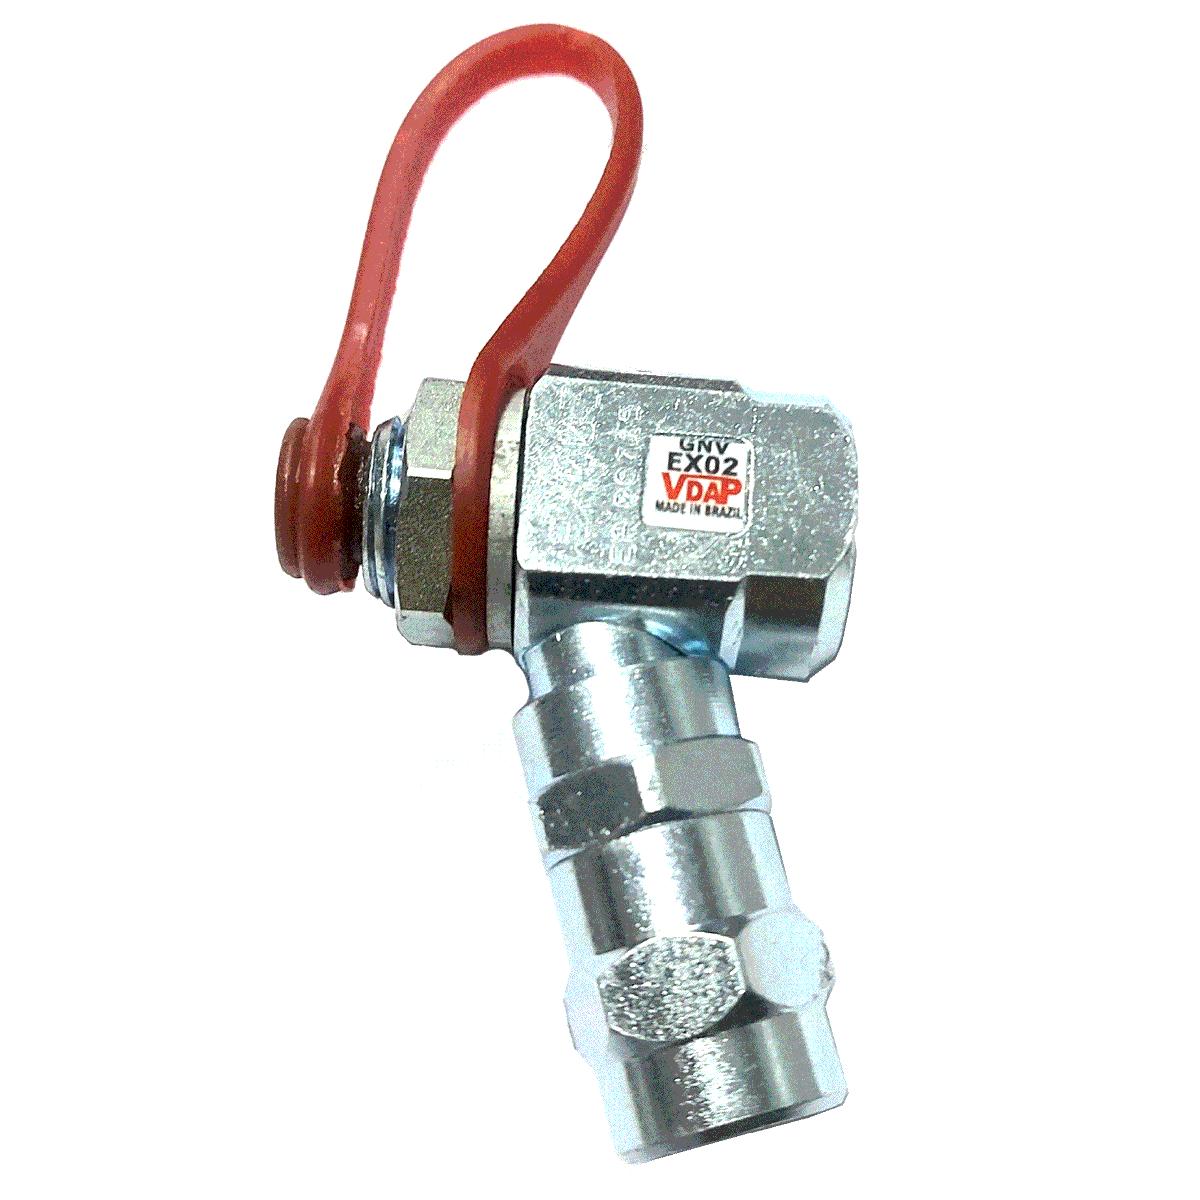 Kit 2 Válvulas VDAP Externa e Abastecimento GNV